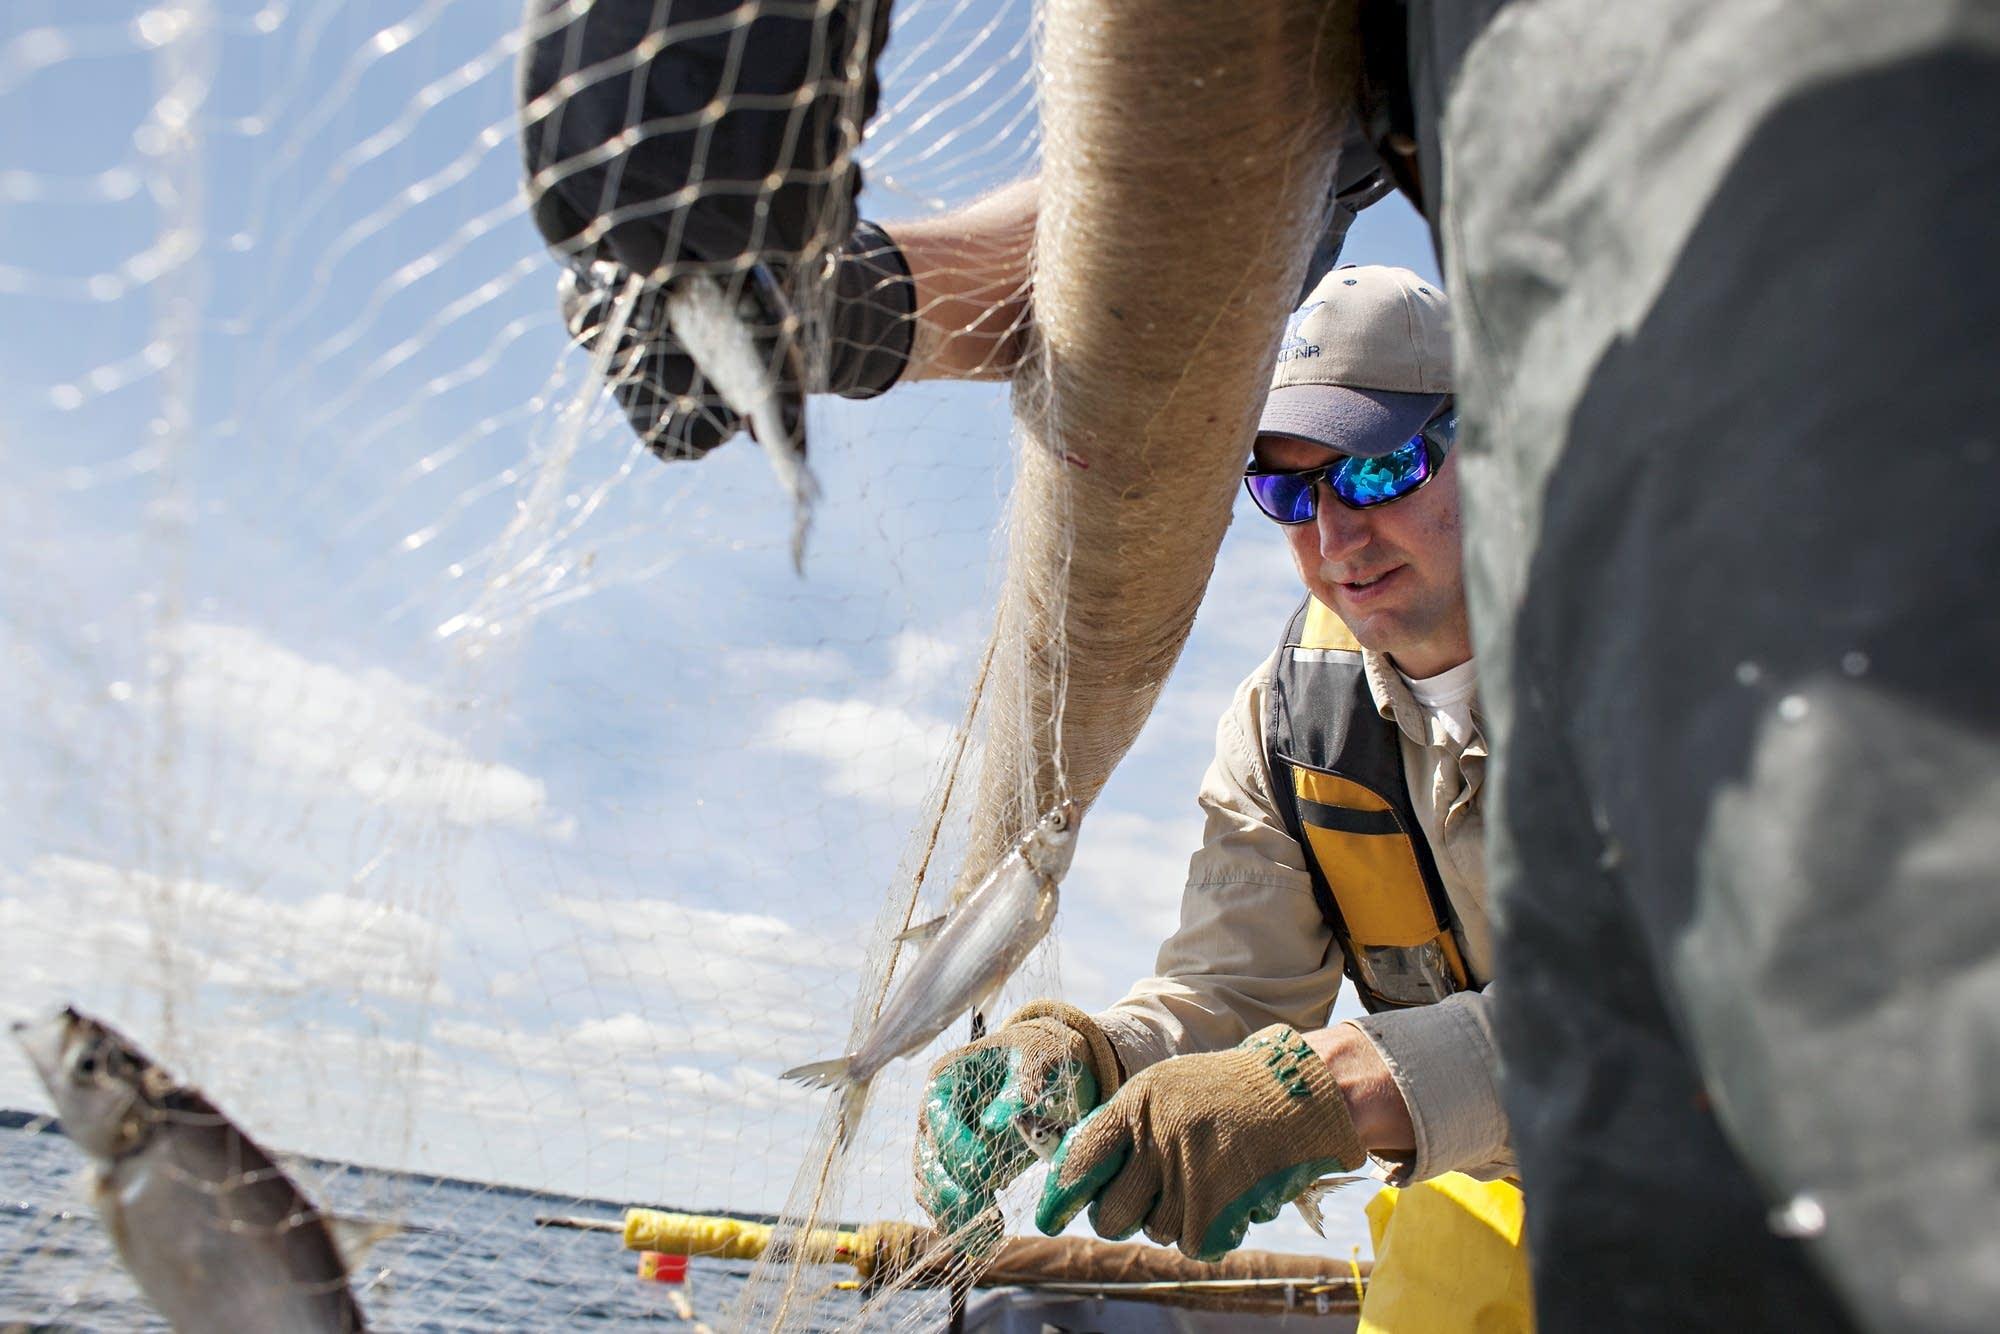 Project coordinator Casey Schoenebeck removes ciscoes